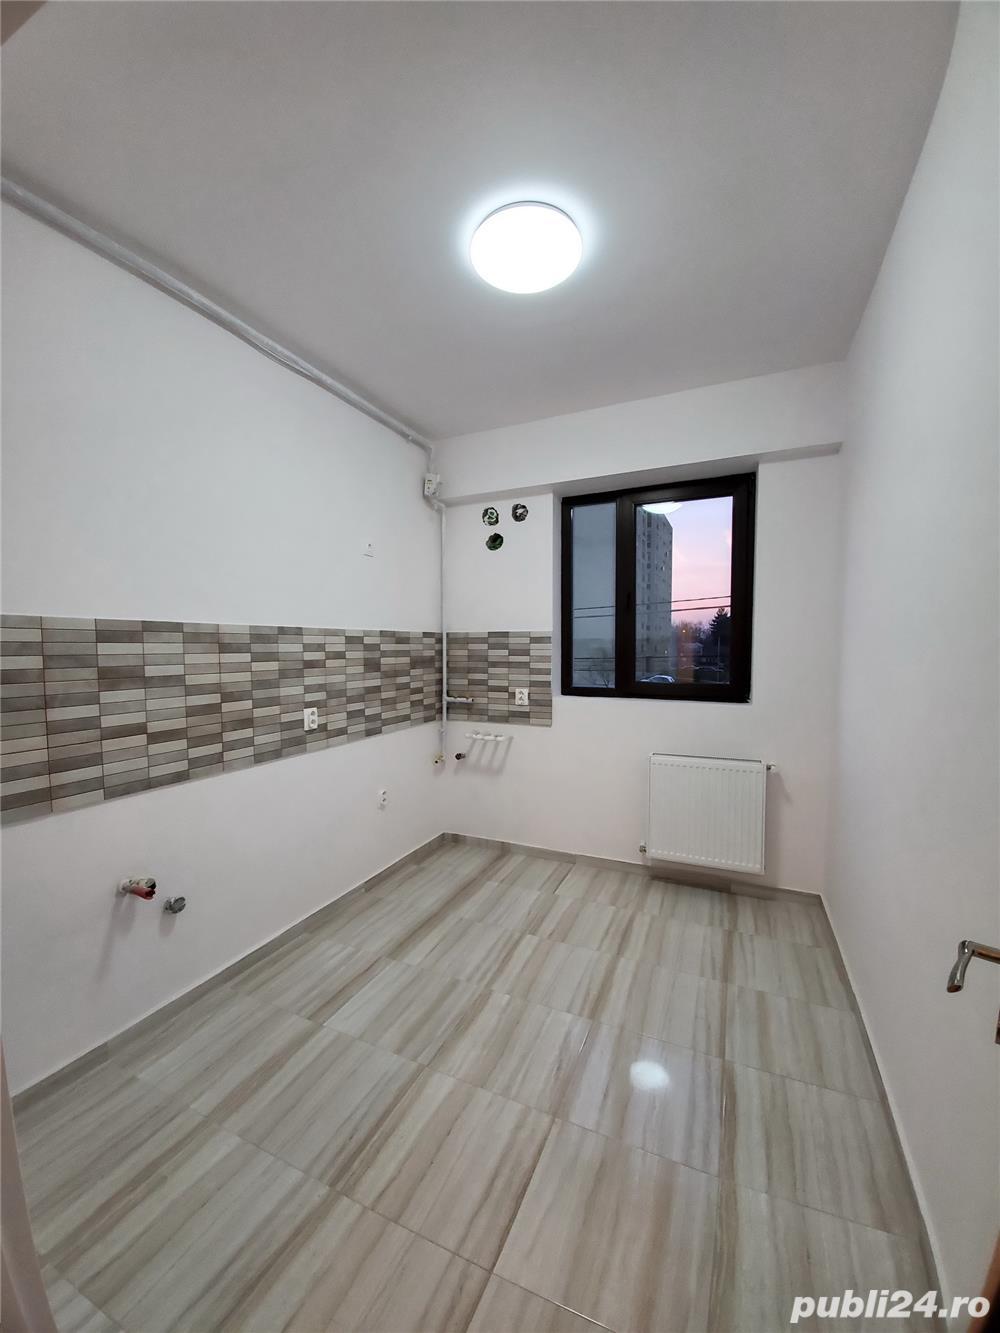 Apartamente cu 1, 2 si 3 camere Giulesti de la 44,500€ cu TVA Inclus